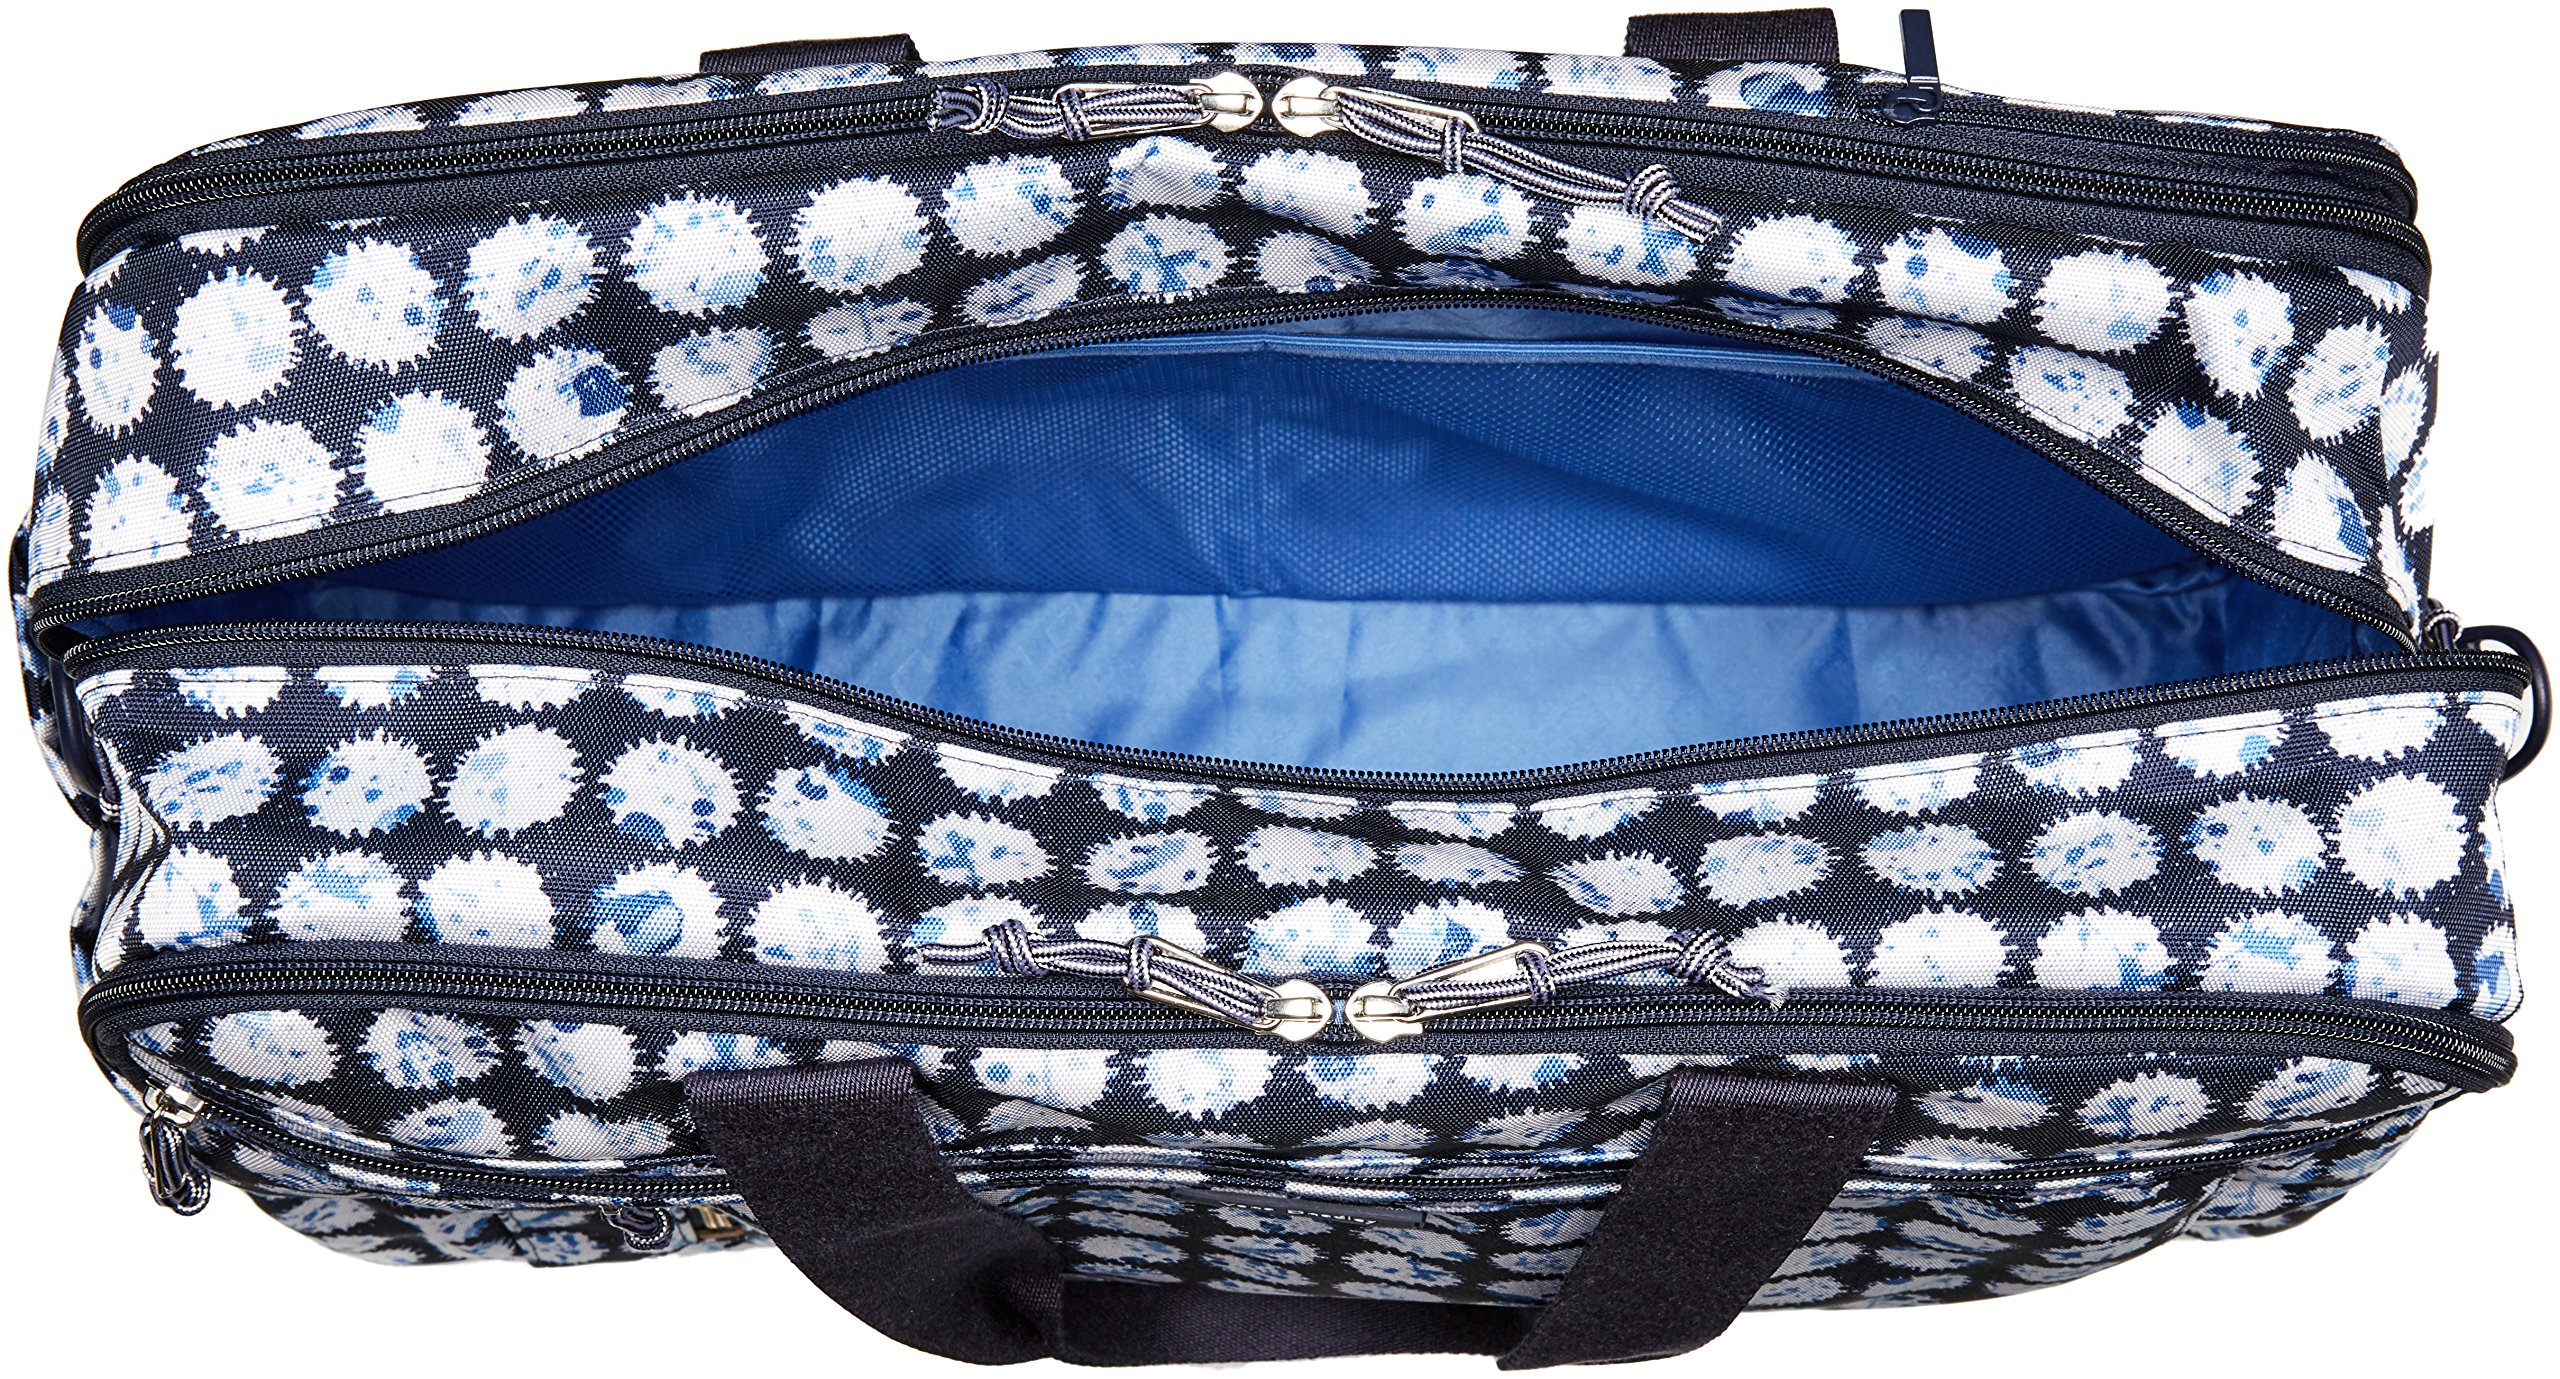 Vera Bradley Lighten up Weekender Travel Bag, Polyester, Splash Dot by Vera Bradley (Image #5)